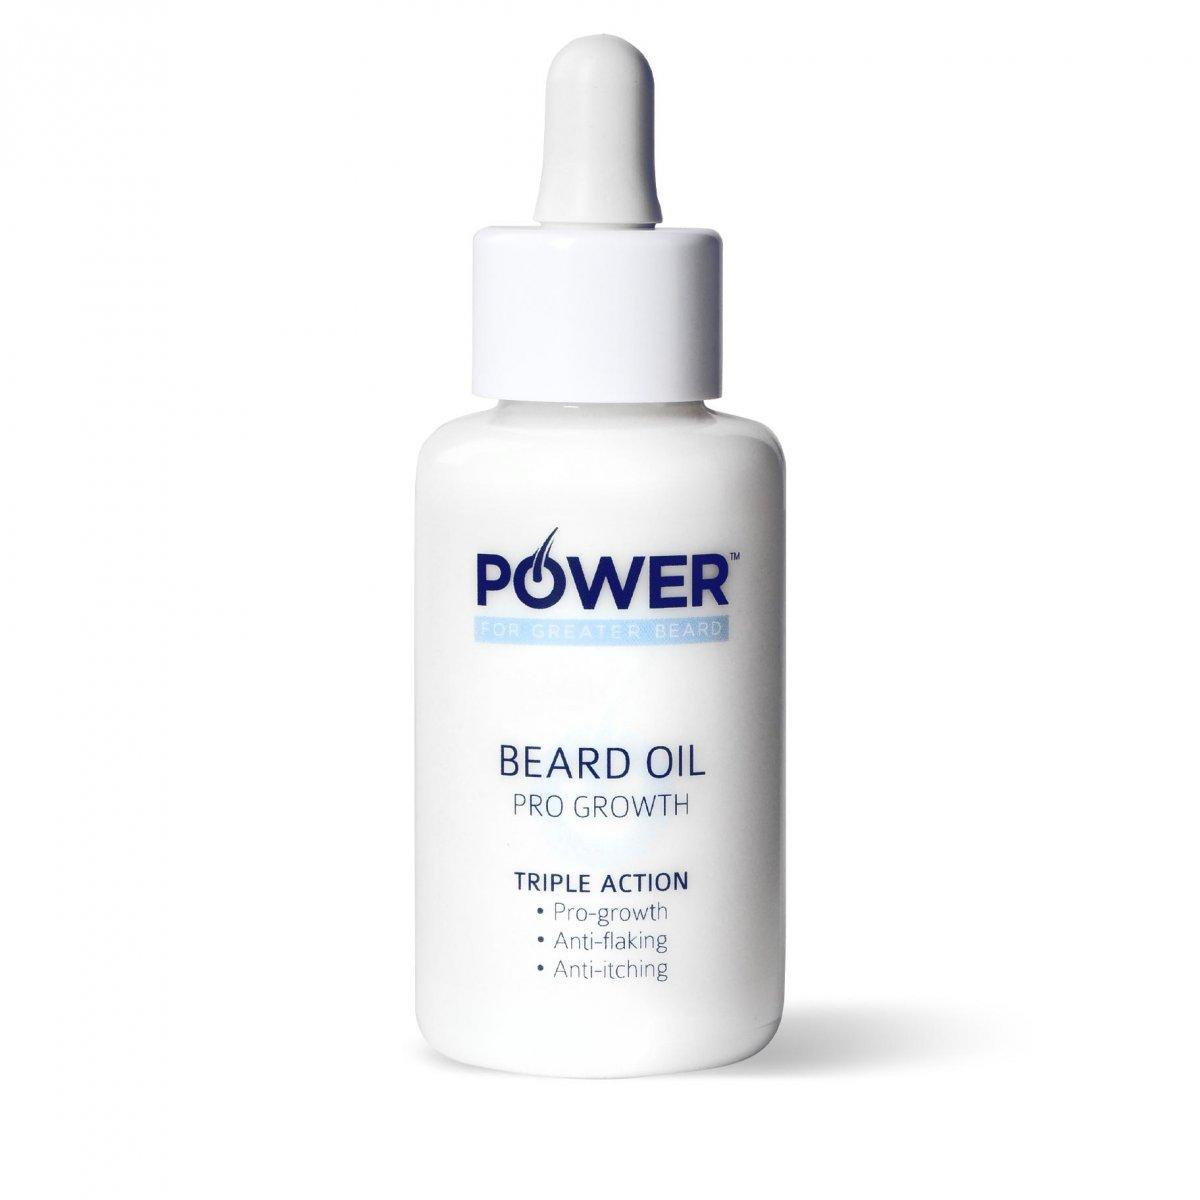 Power Beard Oil Pro Growth